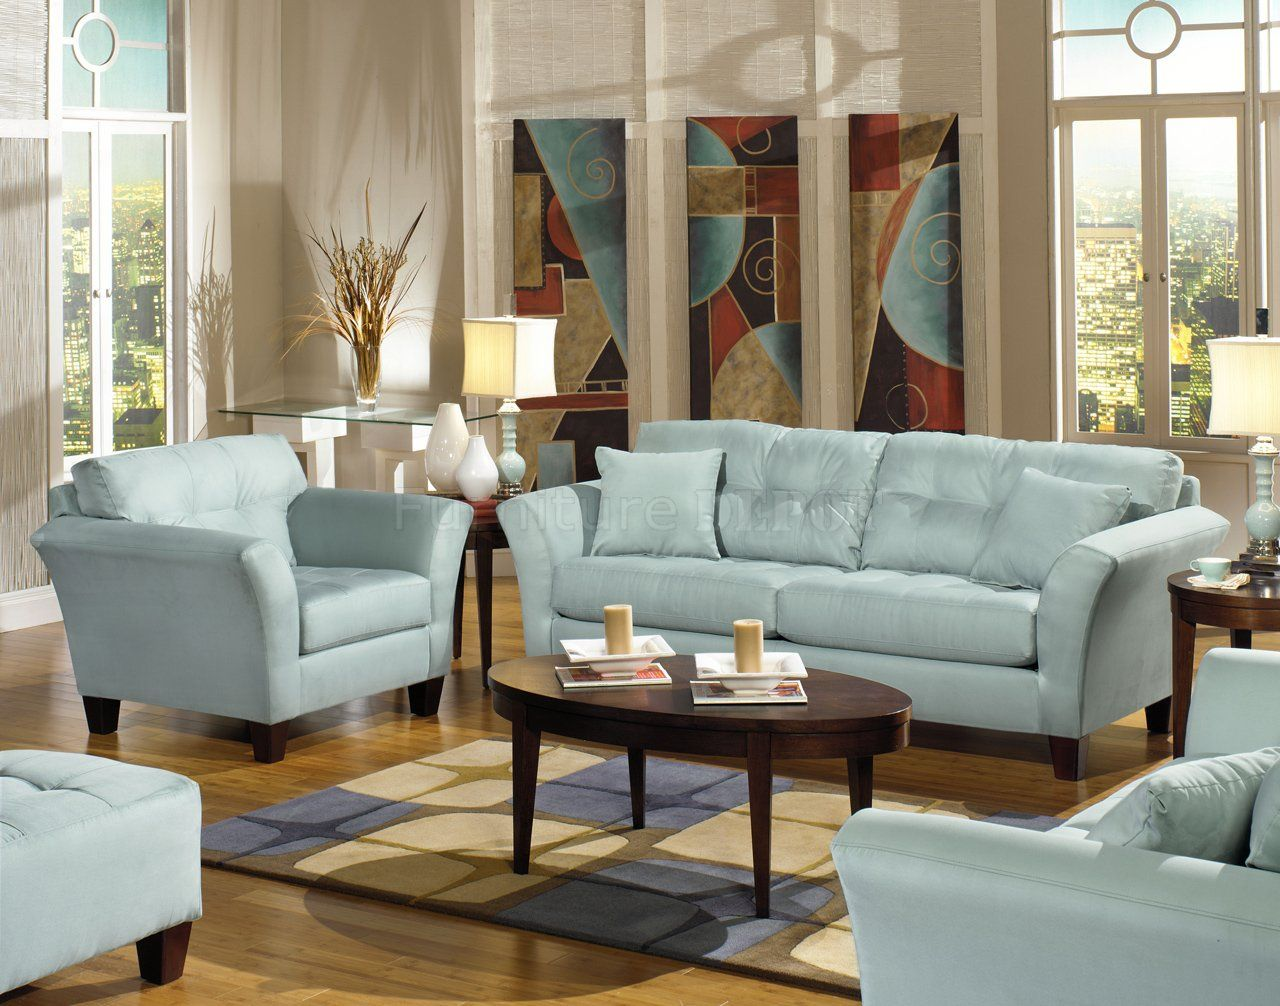 Cool Light Blue Fabric Sofa Luxury Light Blue Fabric Sofa 96 Office Sofa Ideas With Light Blue Light Blue Living Room Blue Sofas Living Room Blue Sofa Living